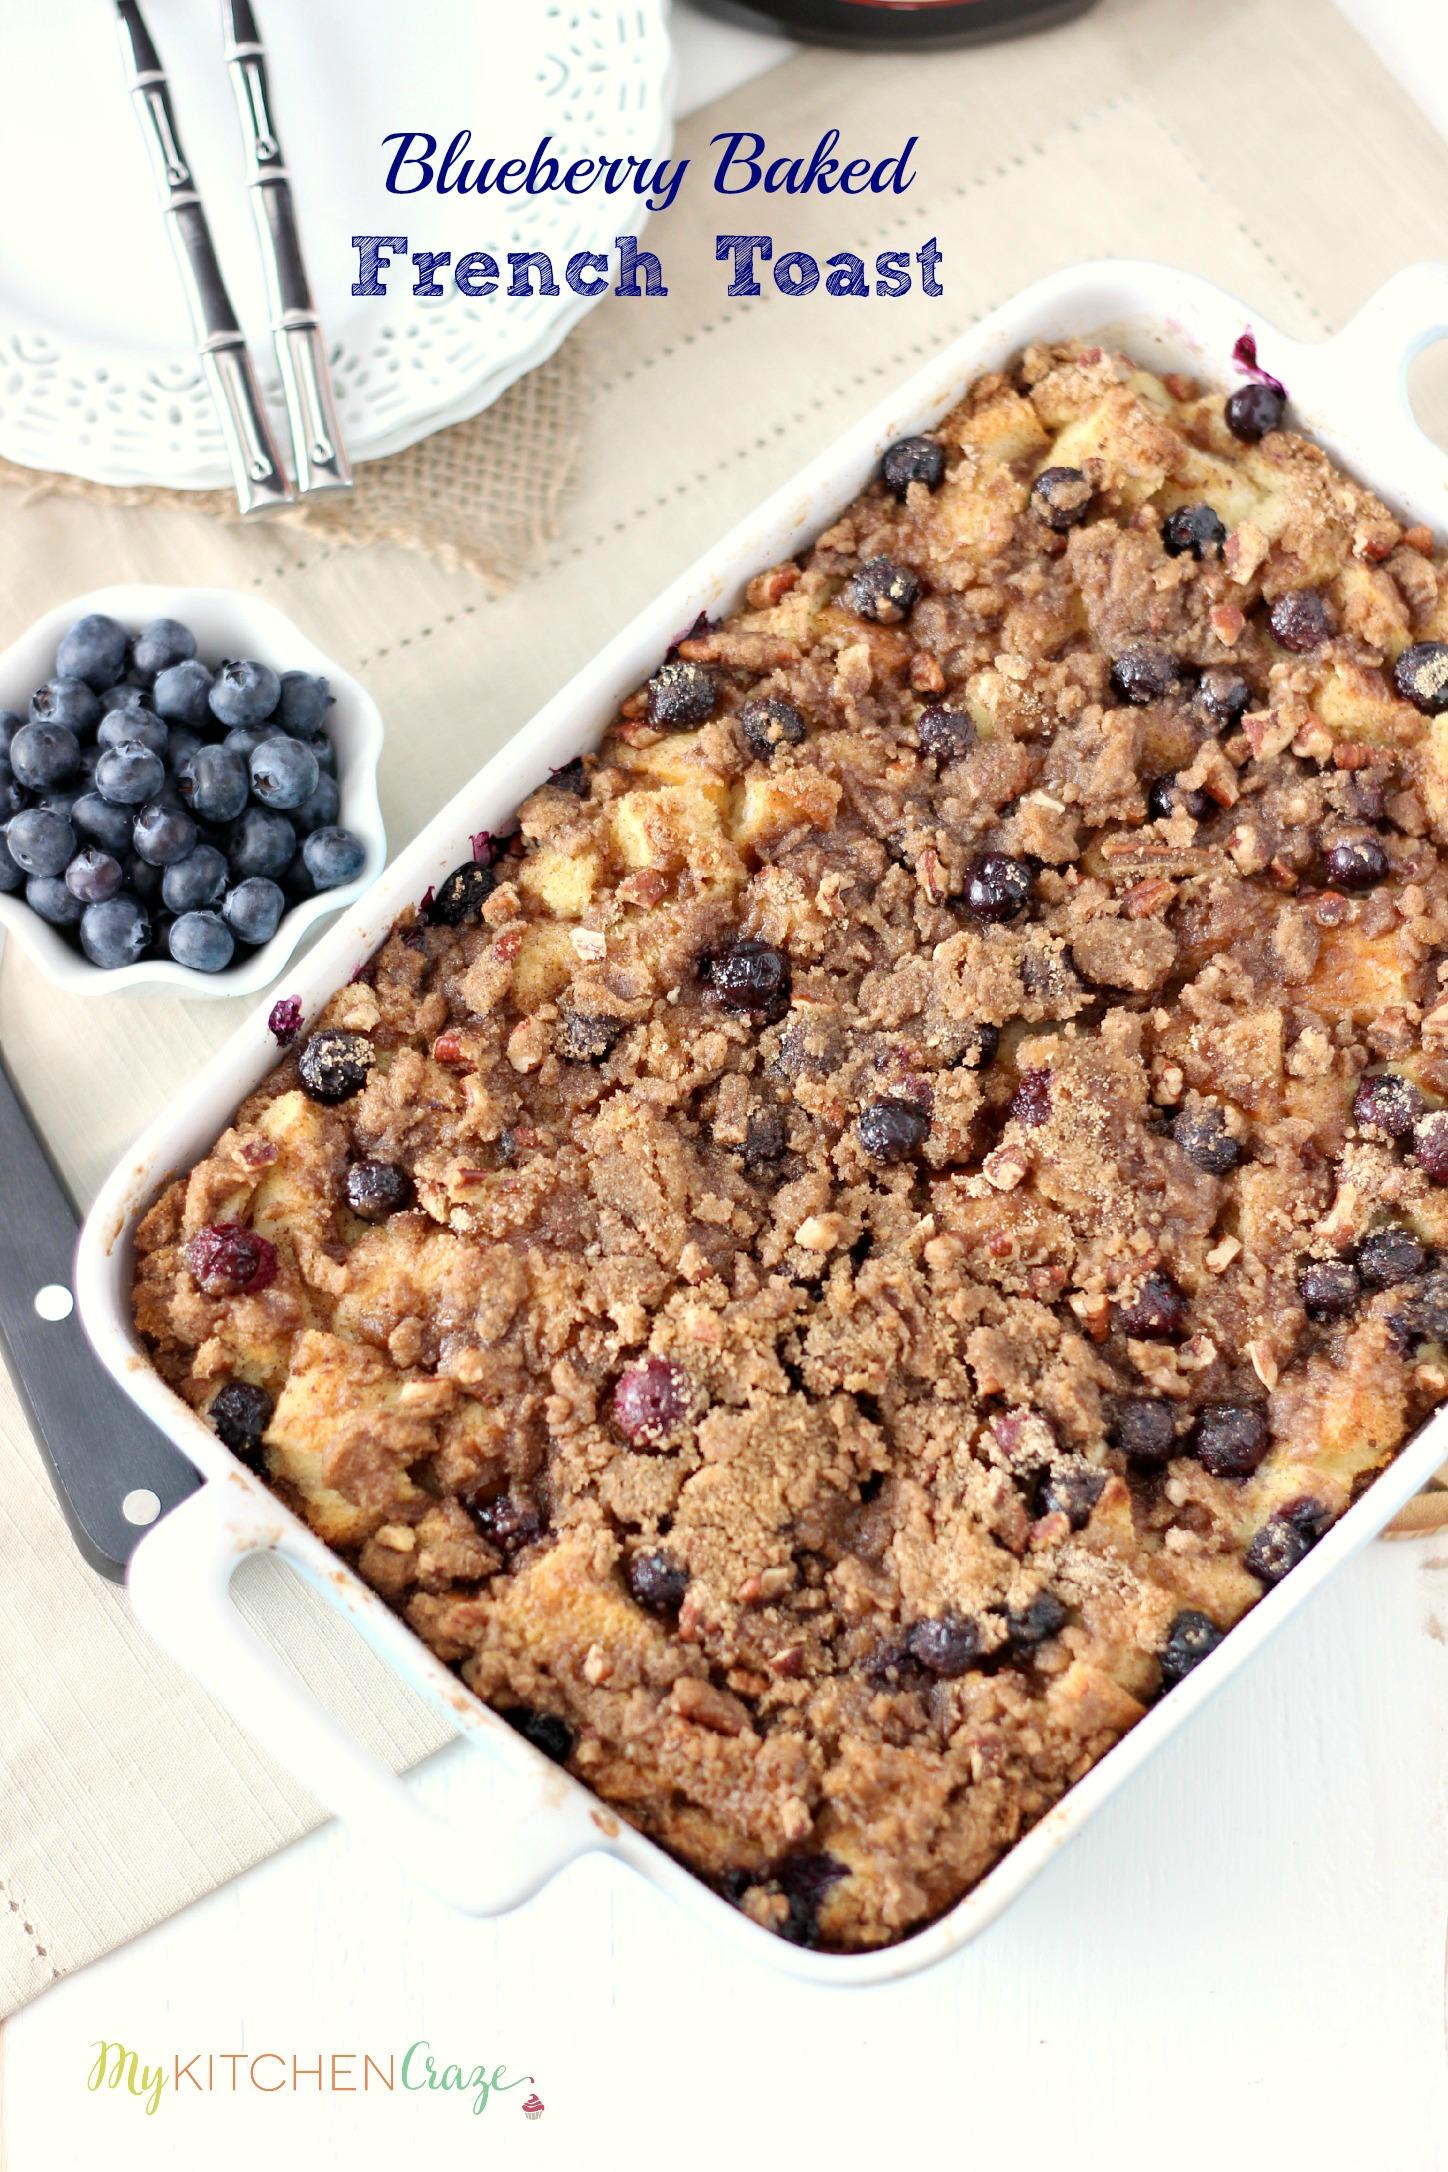 Blueberry Baked French Toast ~ mykitchencraze.com